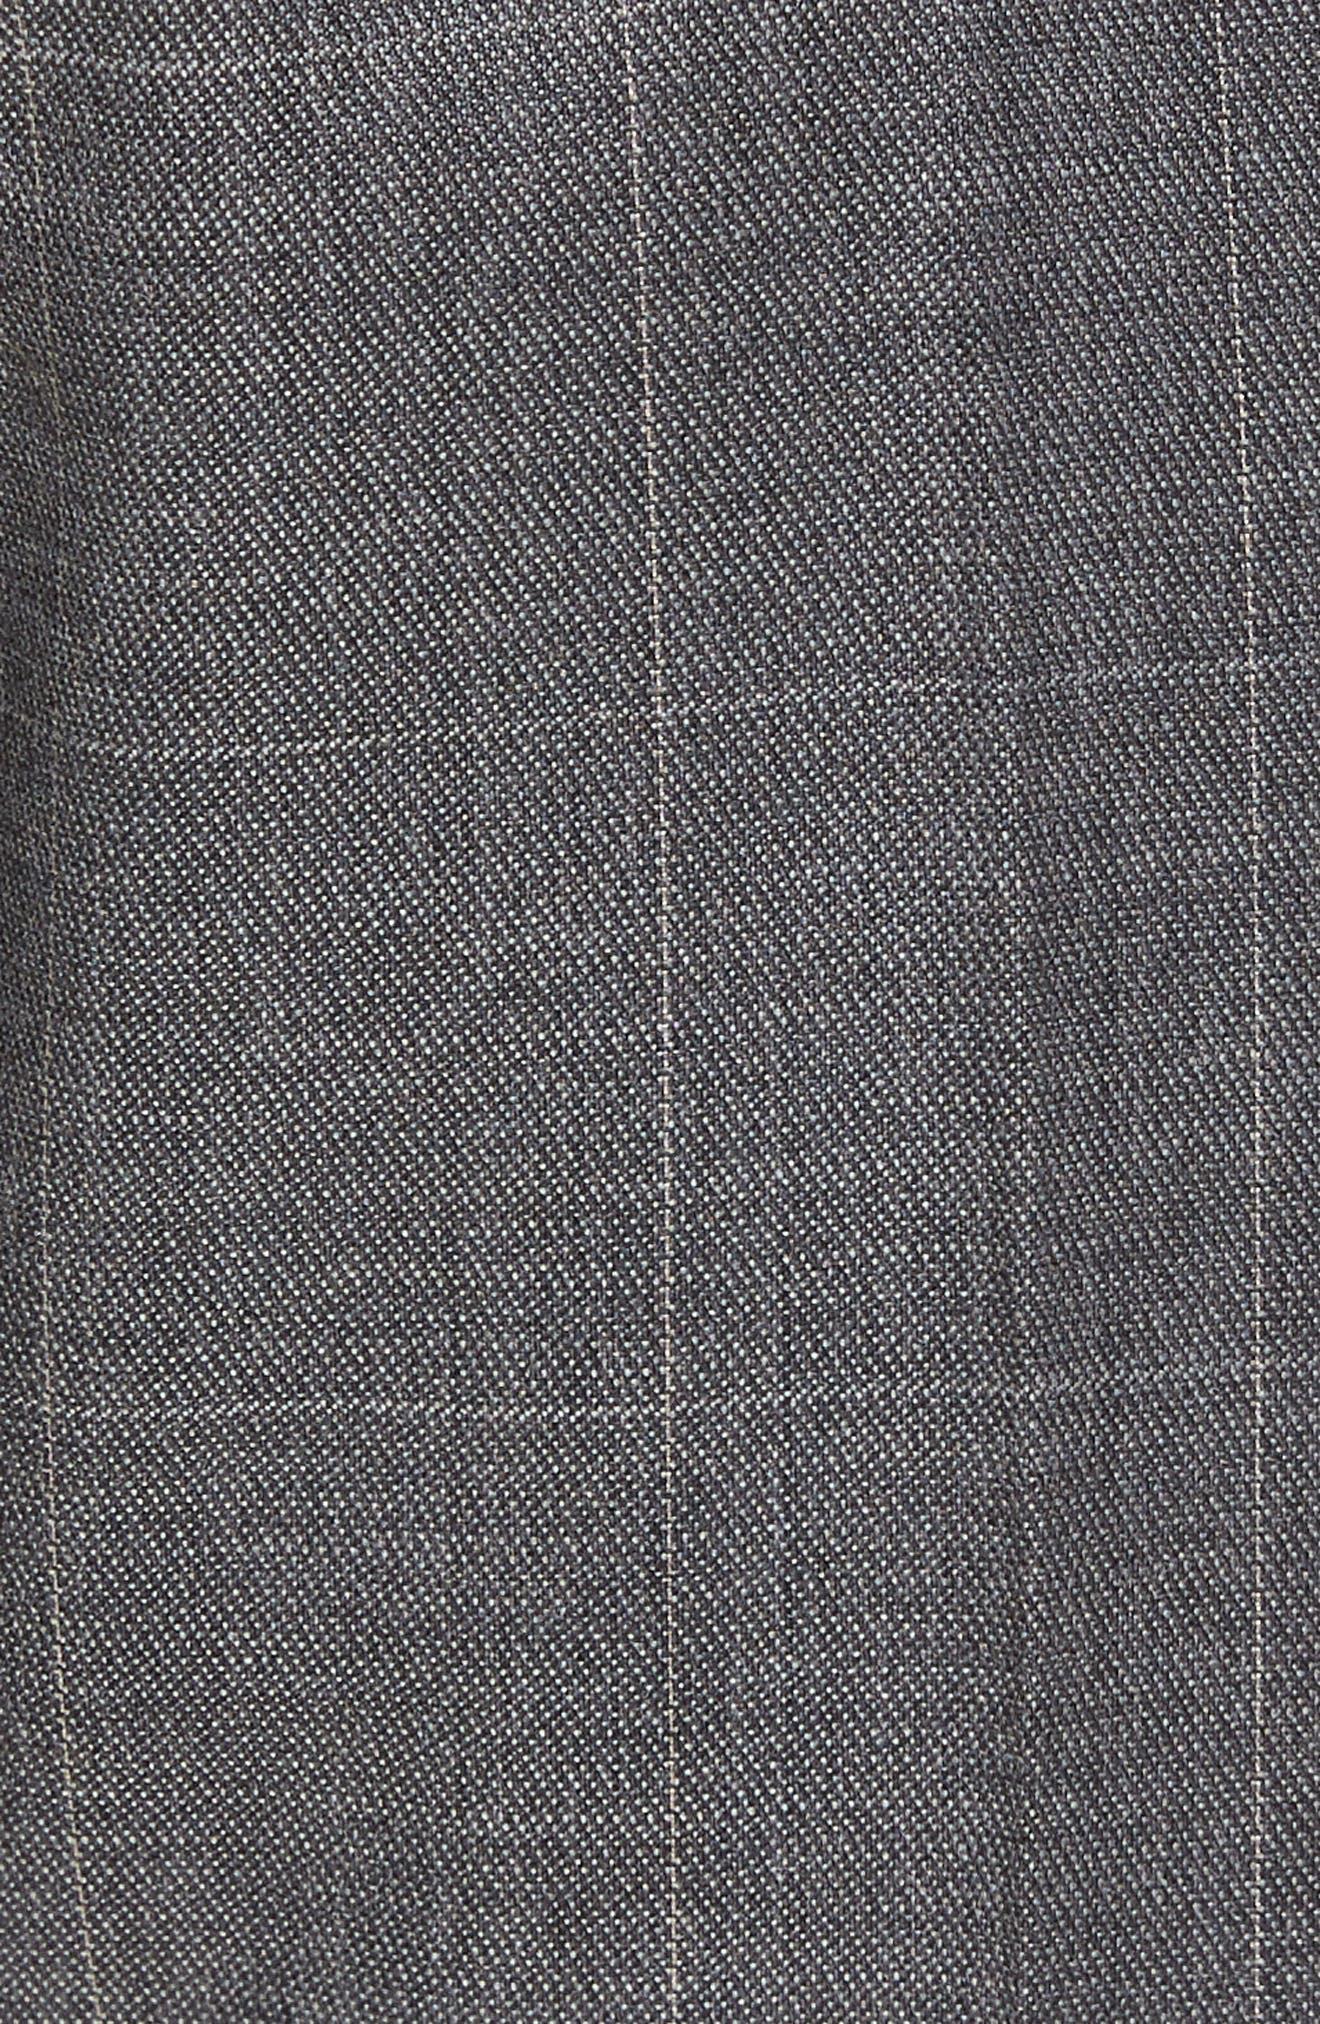 Ludlow Wool Blend Pants,                             Alternate thumbnail 5, color,